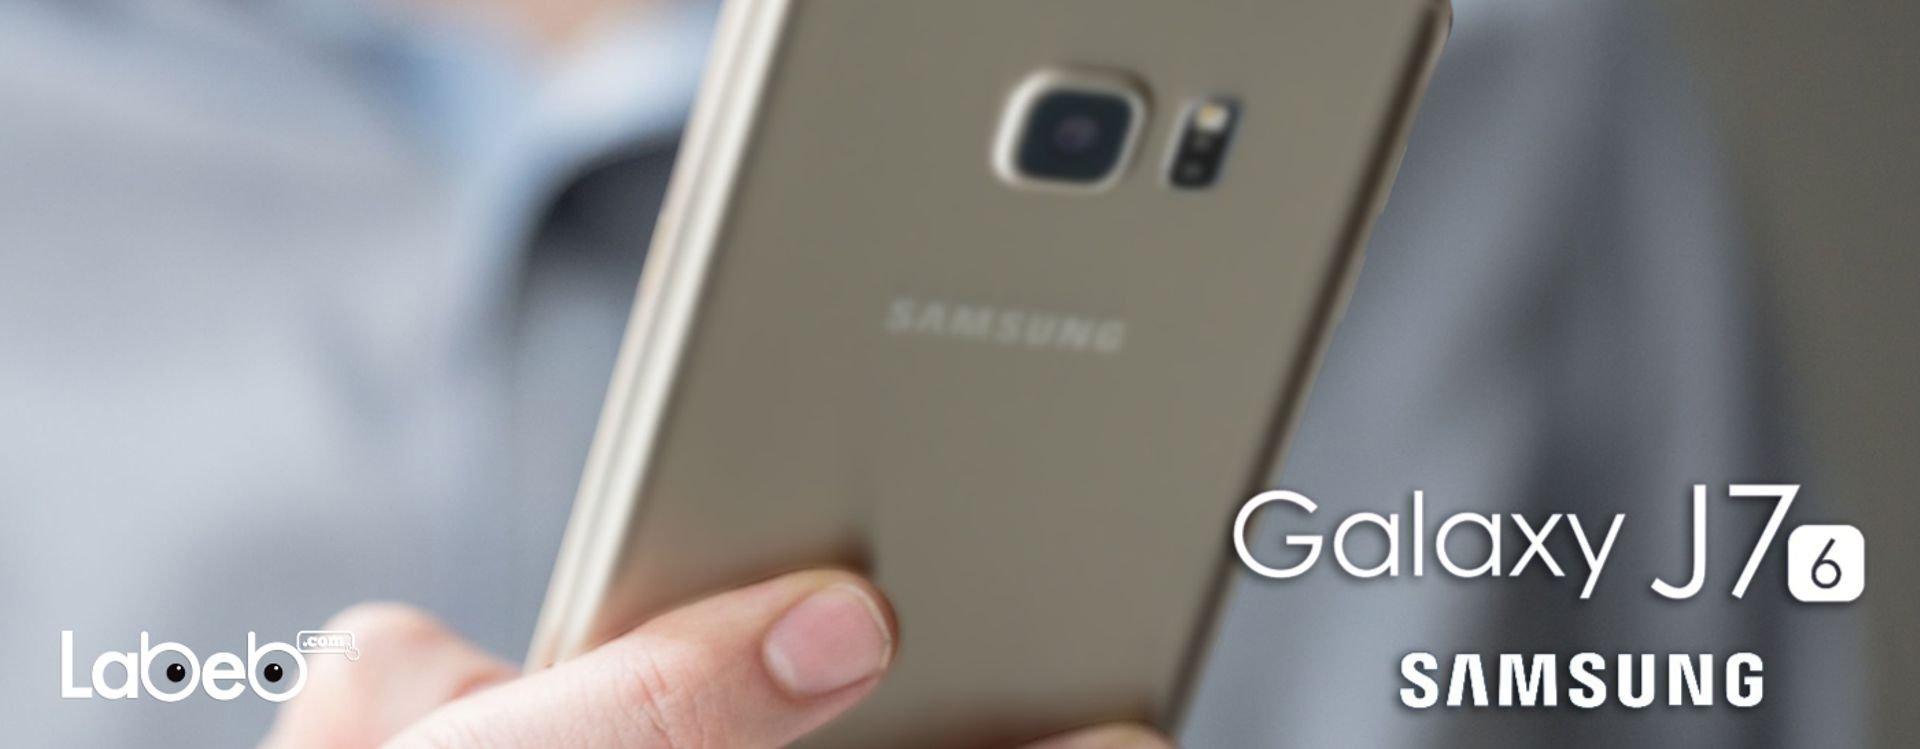 Samsung Galaxy J7 2015 and 2016 versions